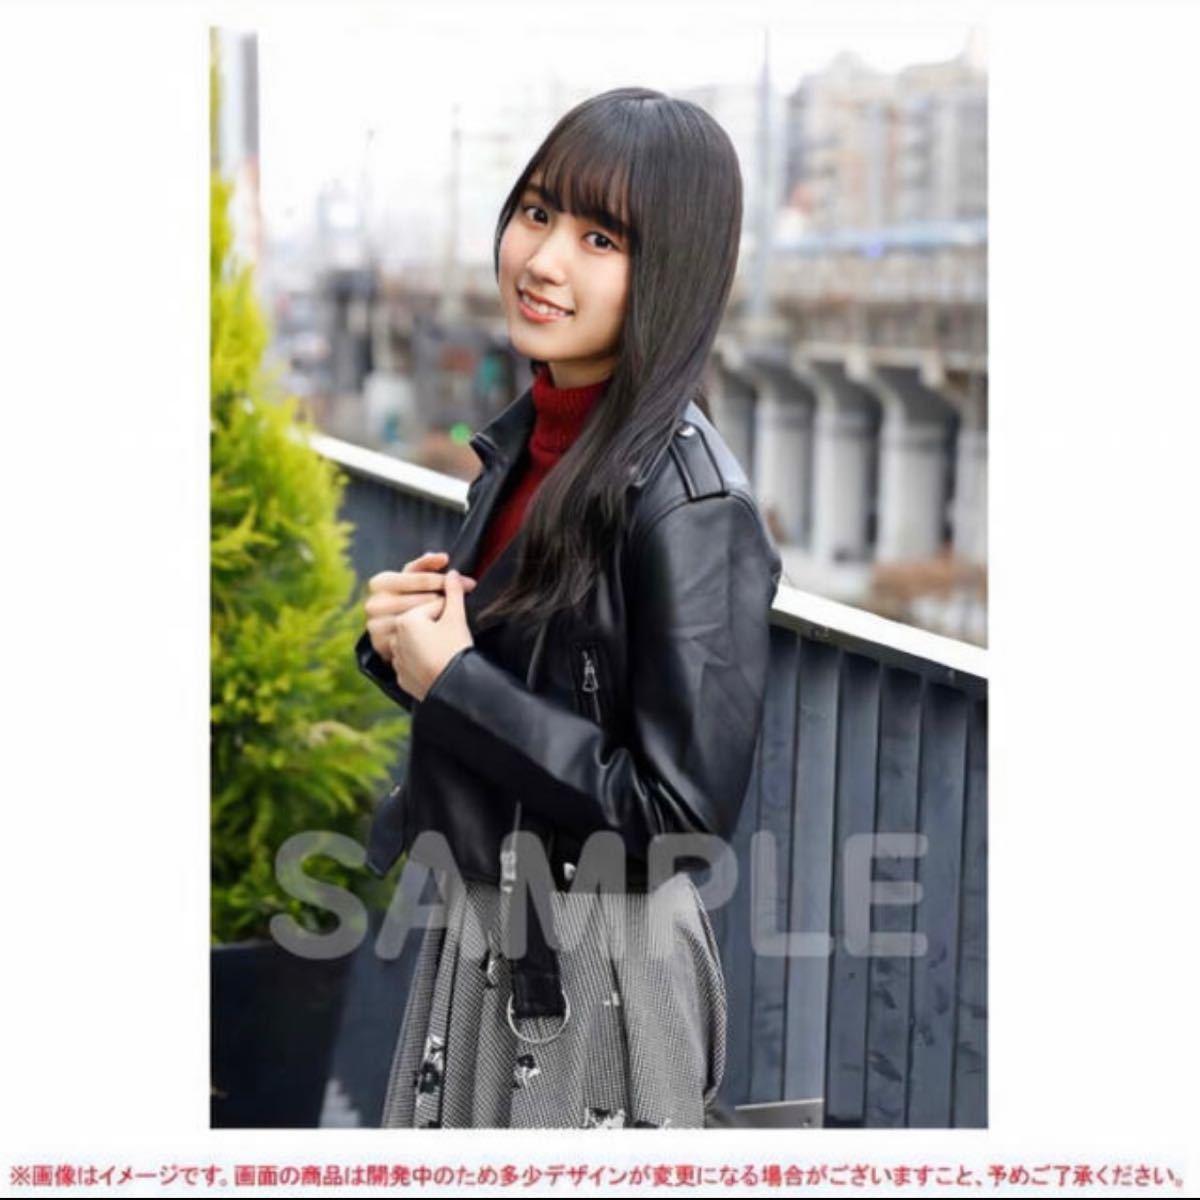 乃木坂46 生写真 賀喜遥香 個別生写真 I see 5種コンプ(5枚セット)